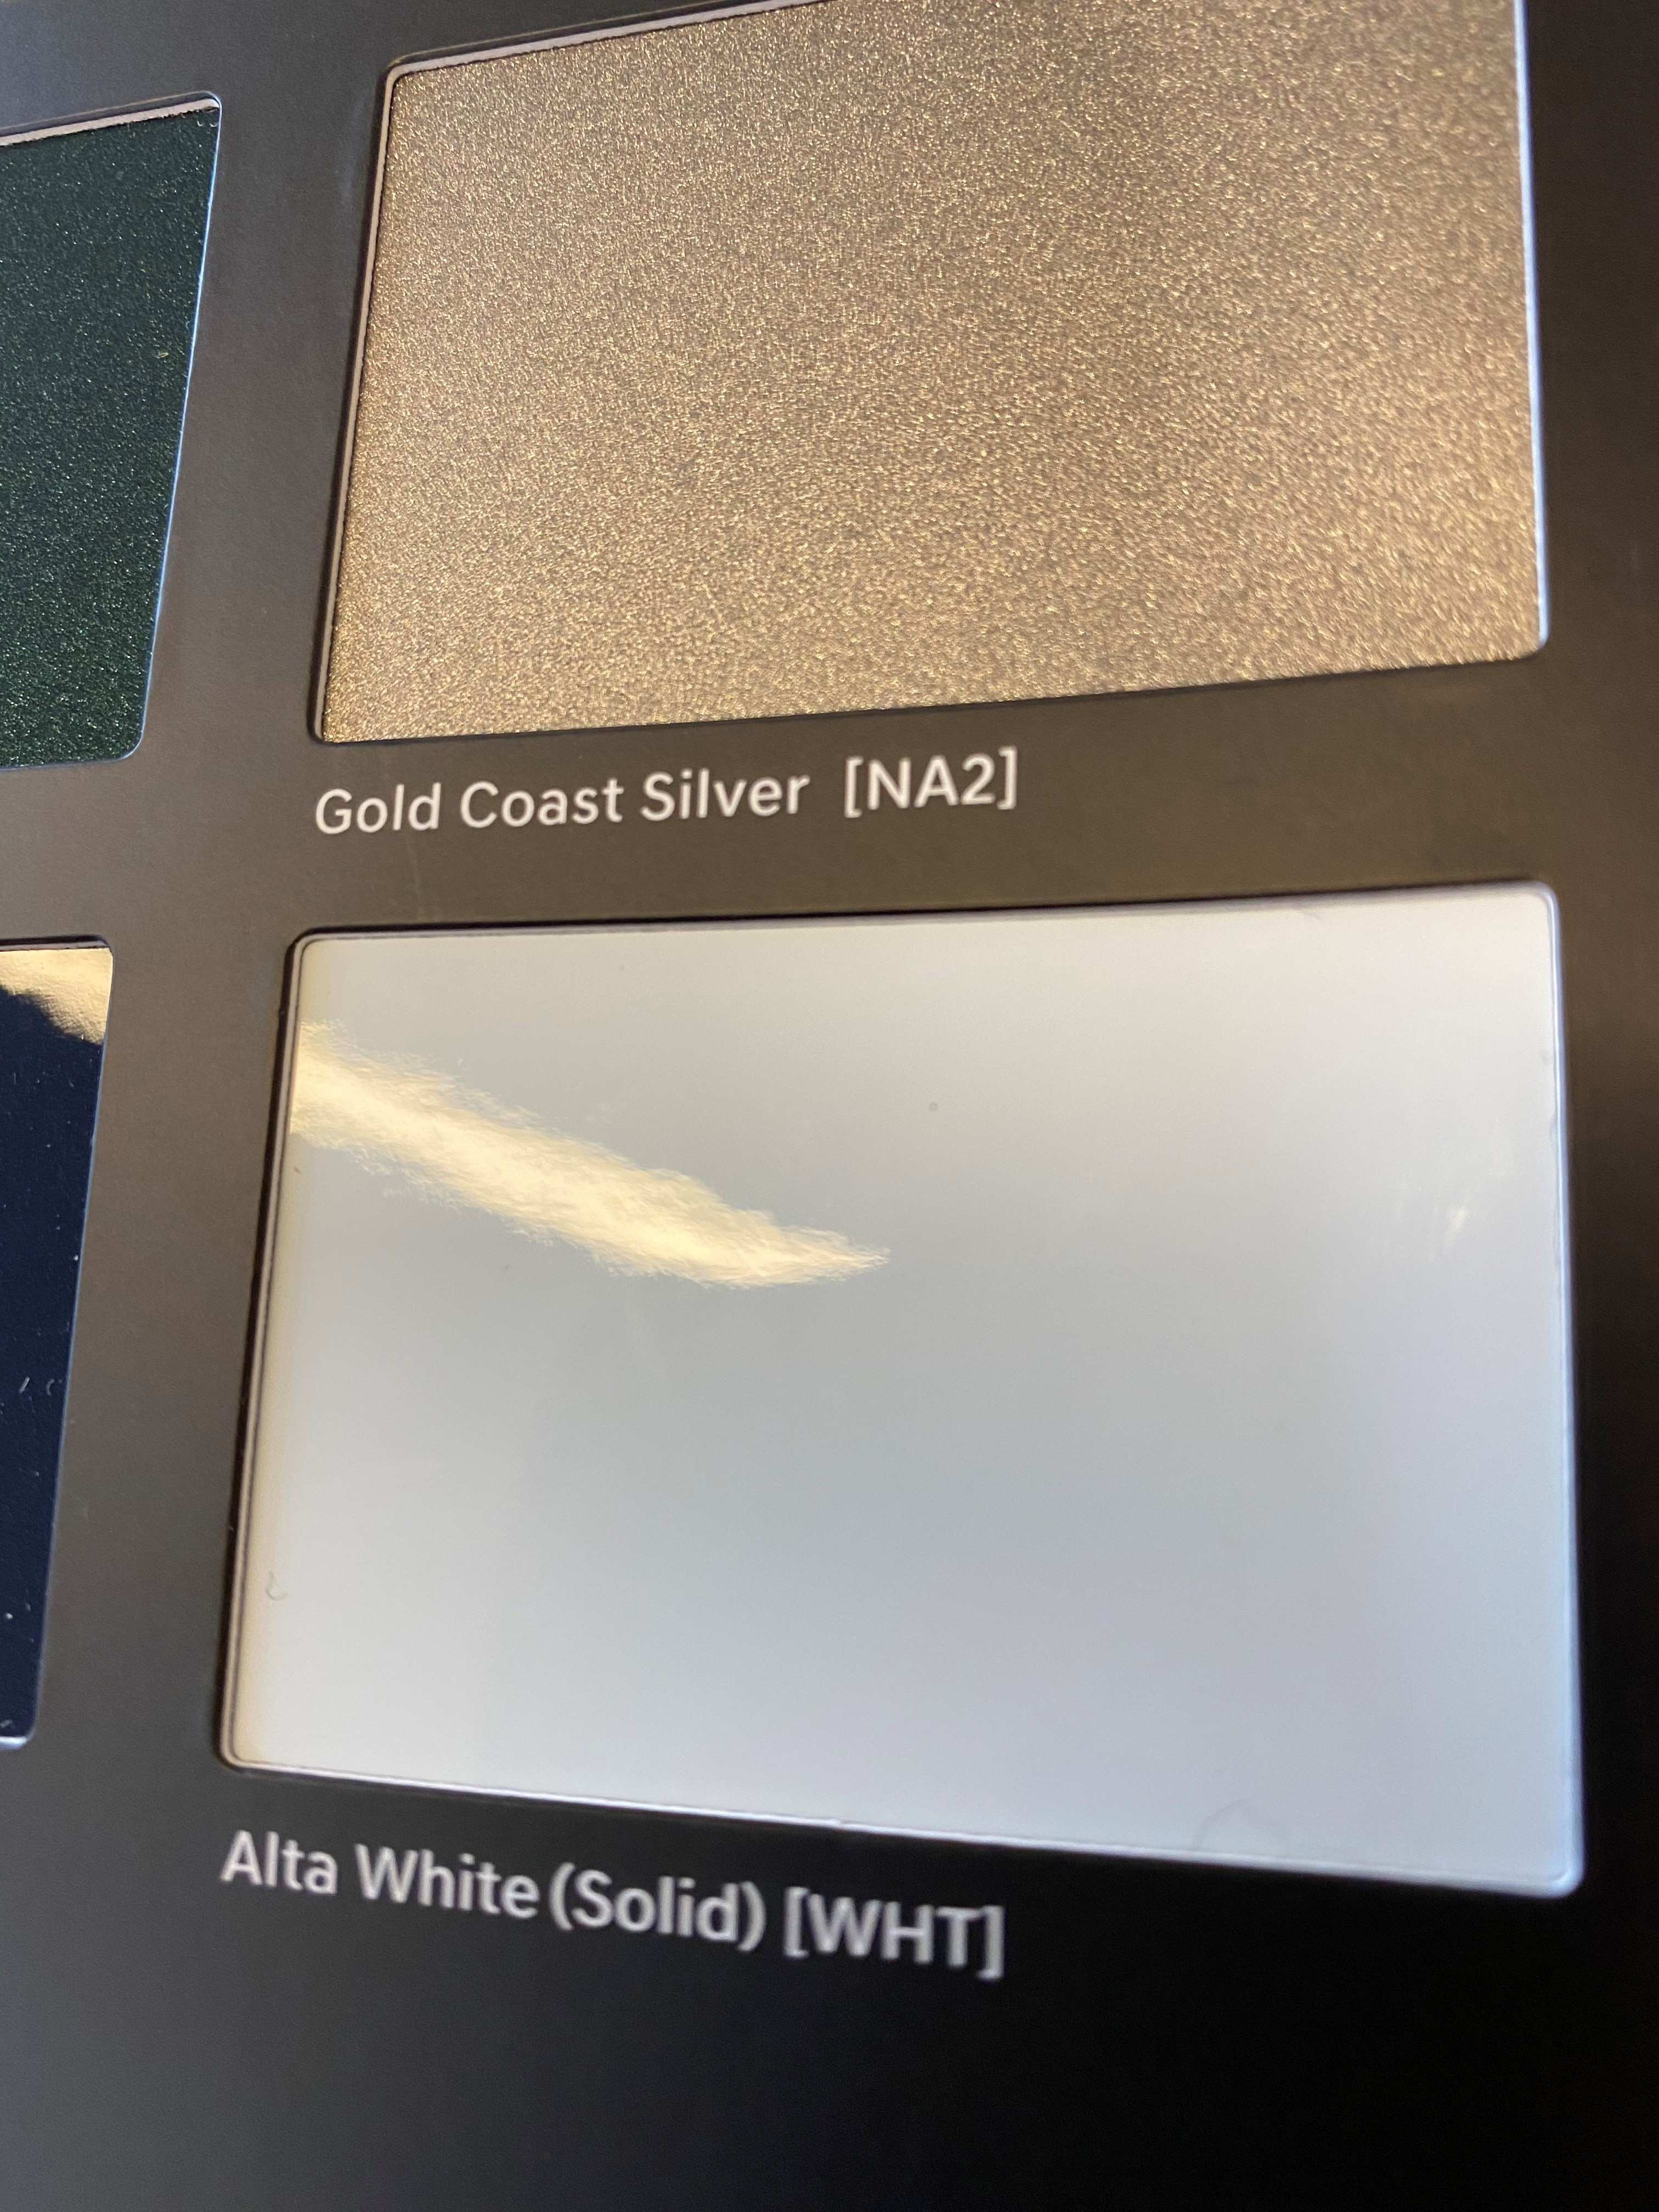 Exterior White Uyuni Vs Alta Genesis Gv80 Forum Pricing